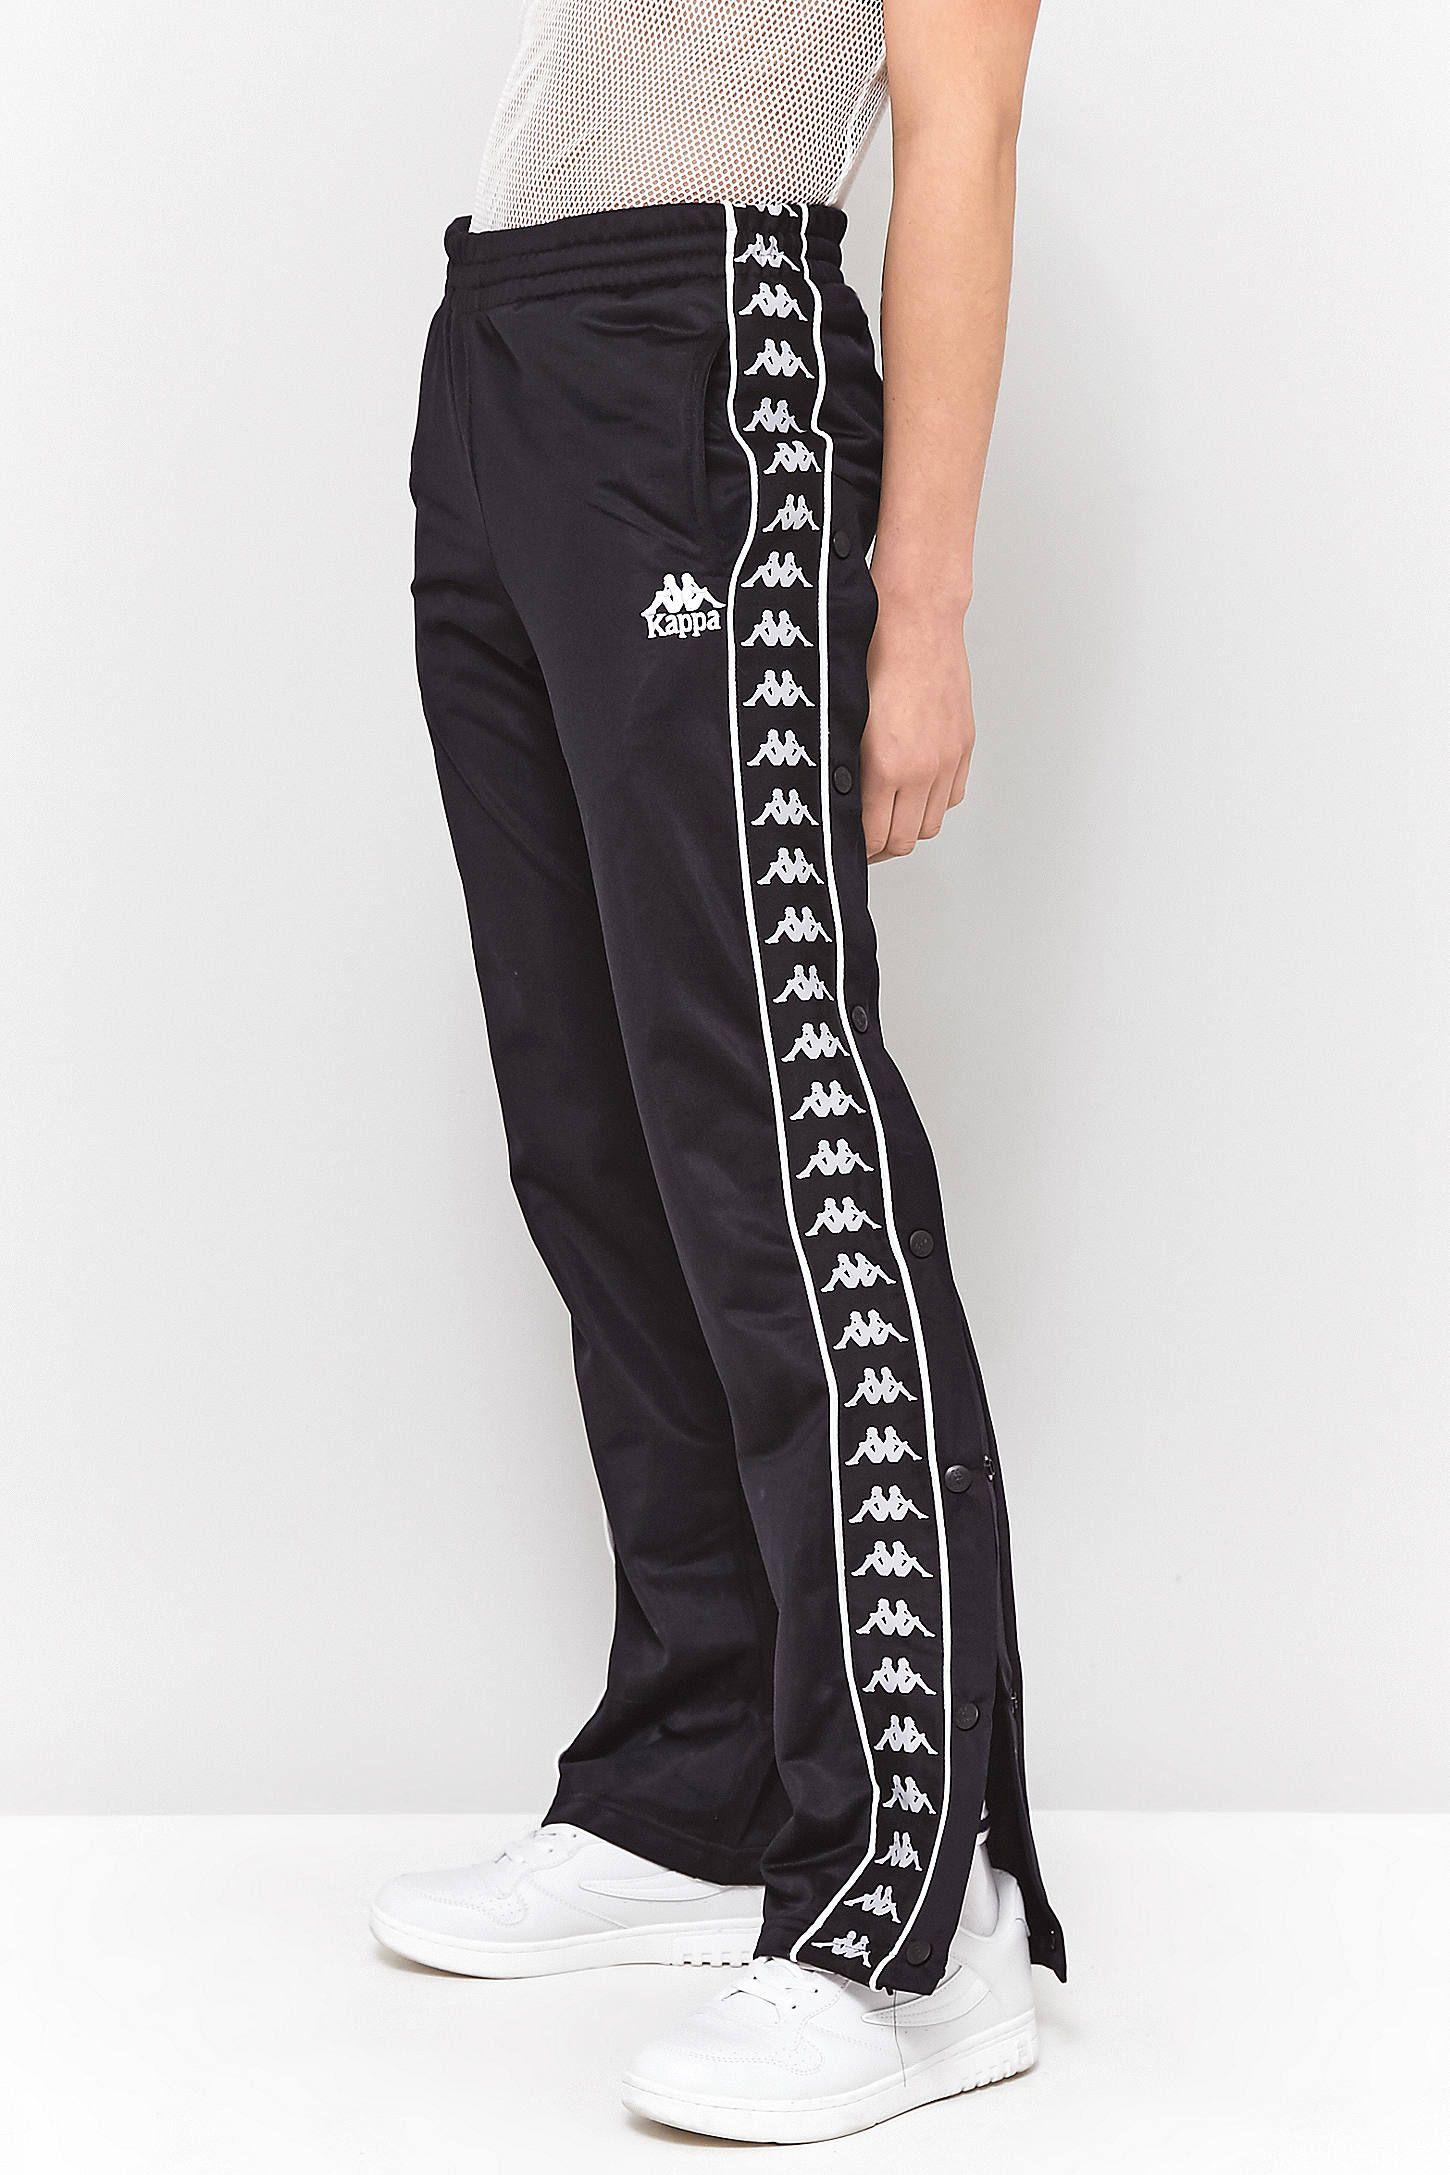 e8591ffb8de25 Kappa - Bas de survêtement Authentic Zeberdee | Sportswear et ...